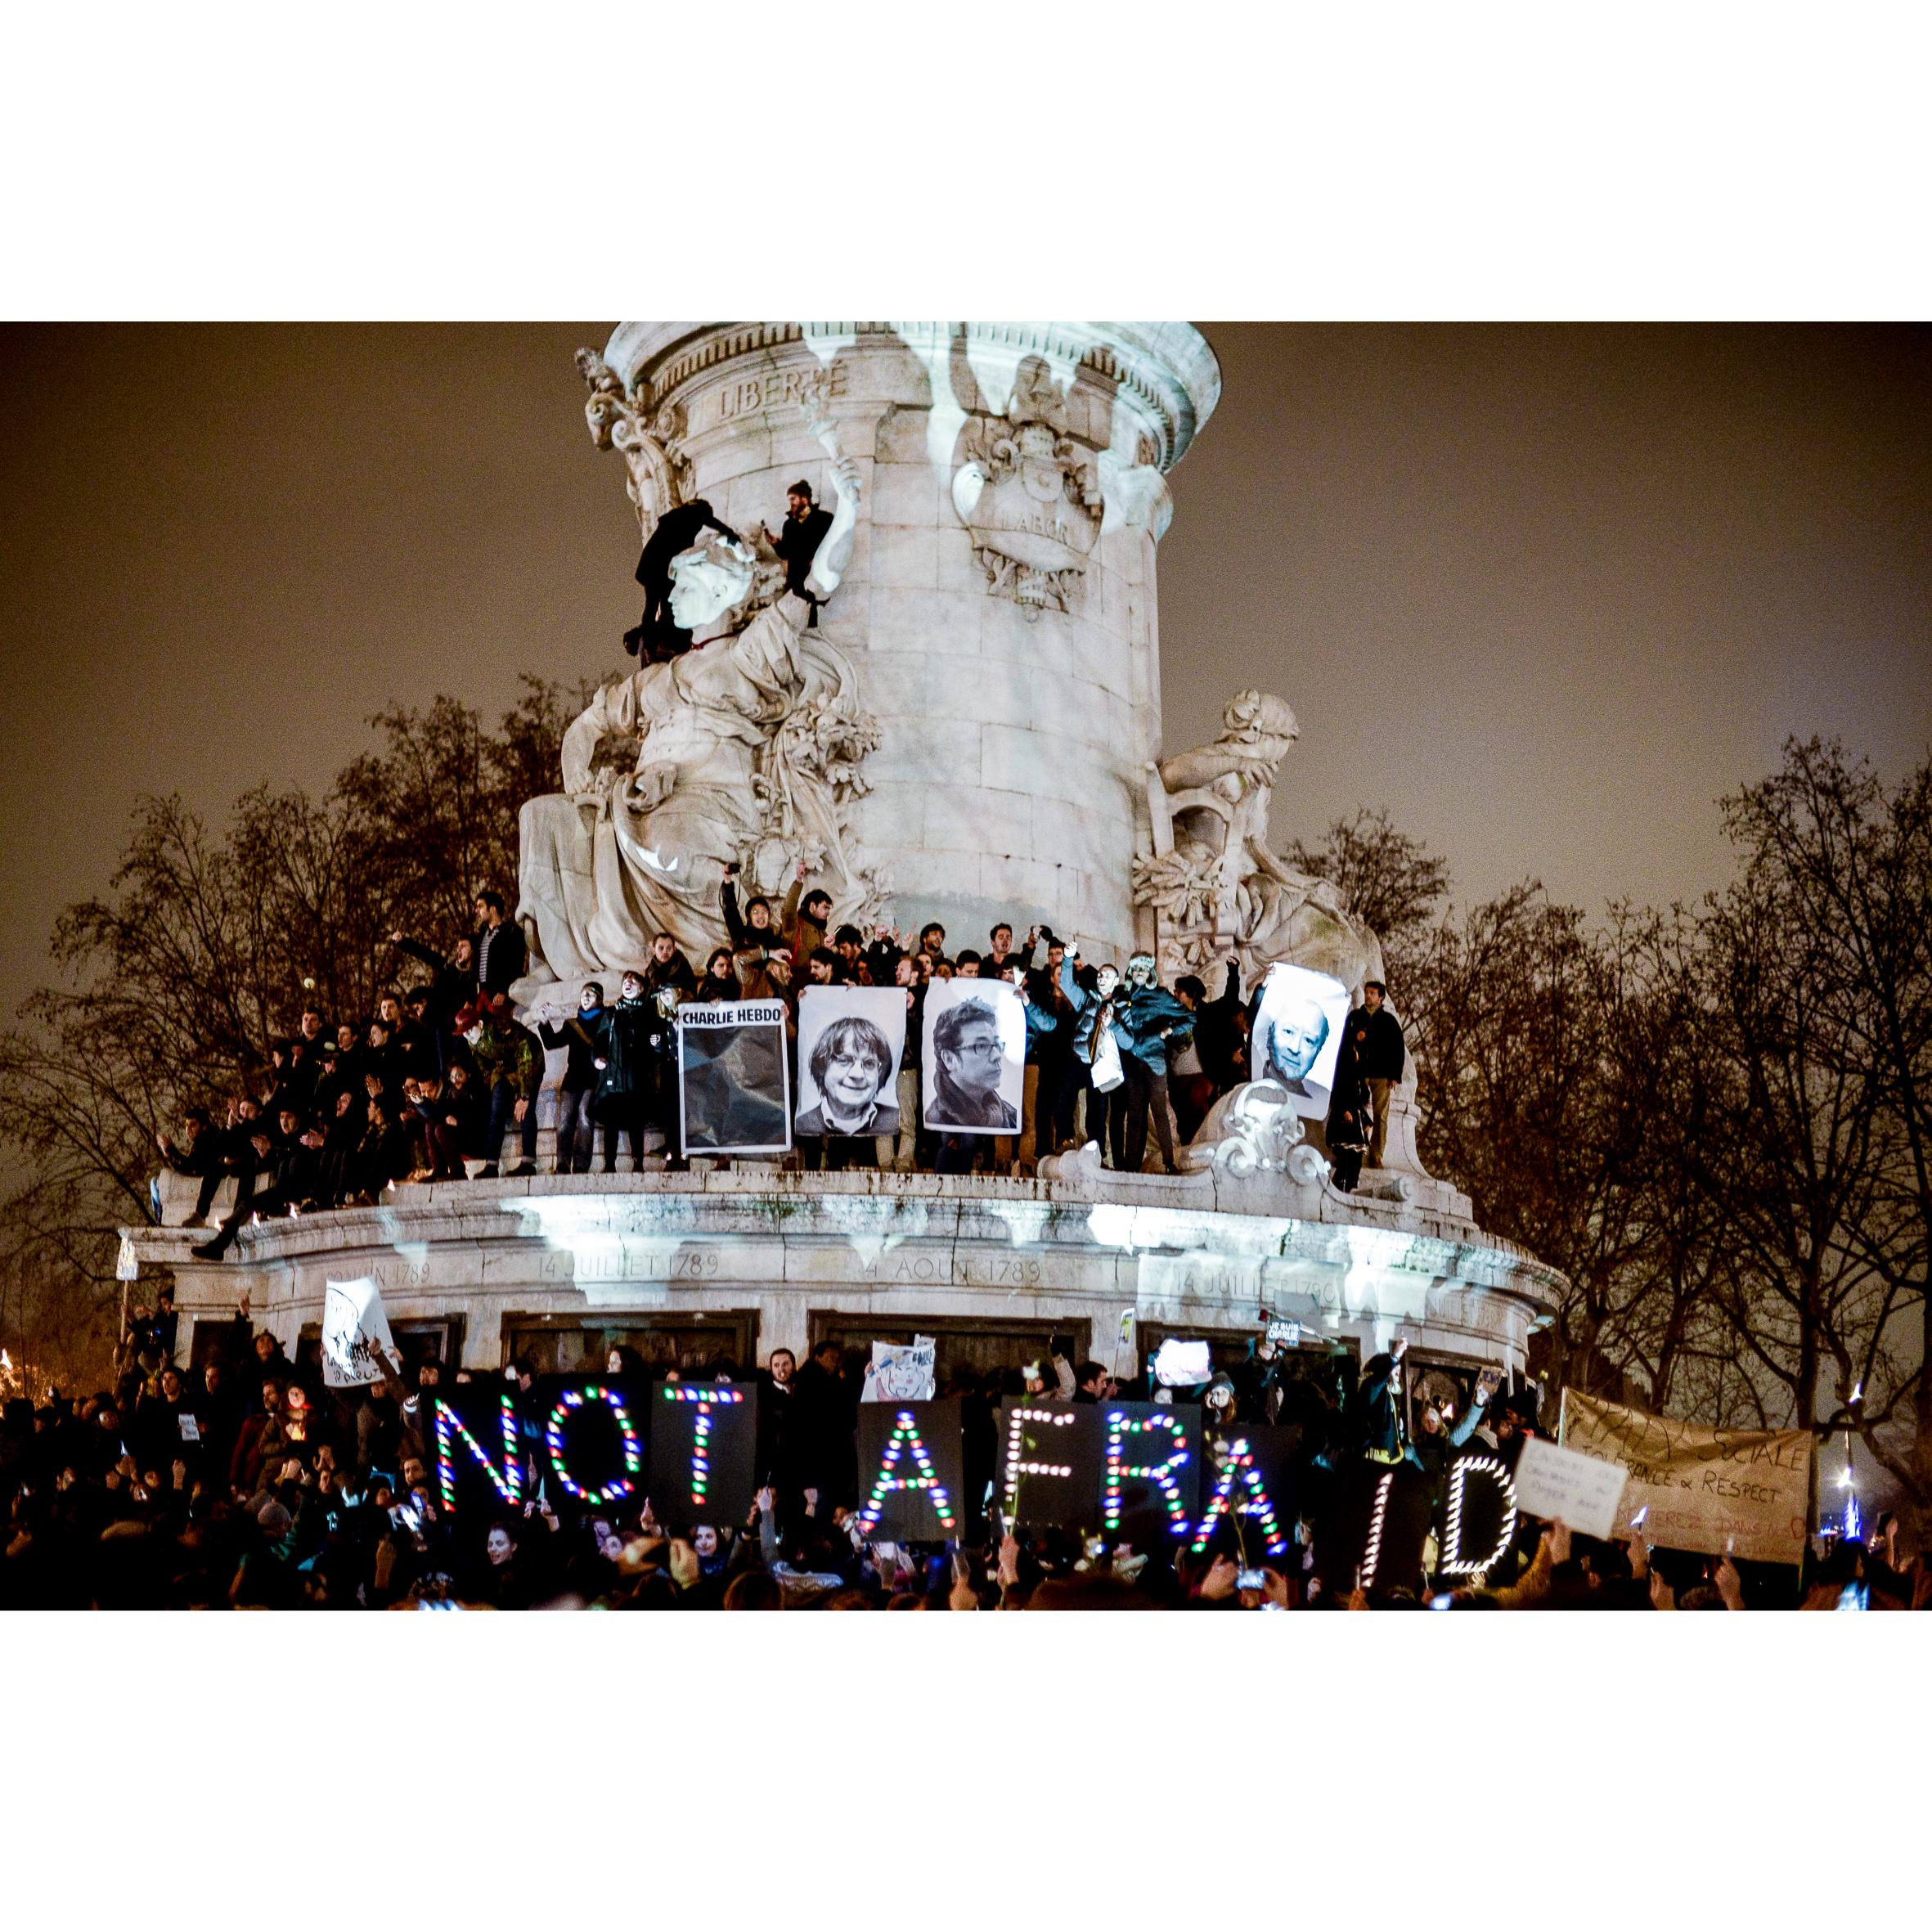 Not Afraid.